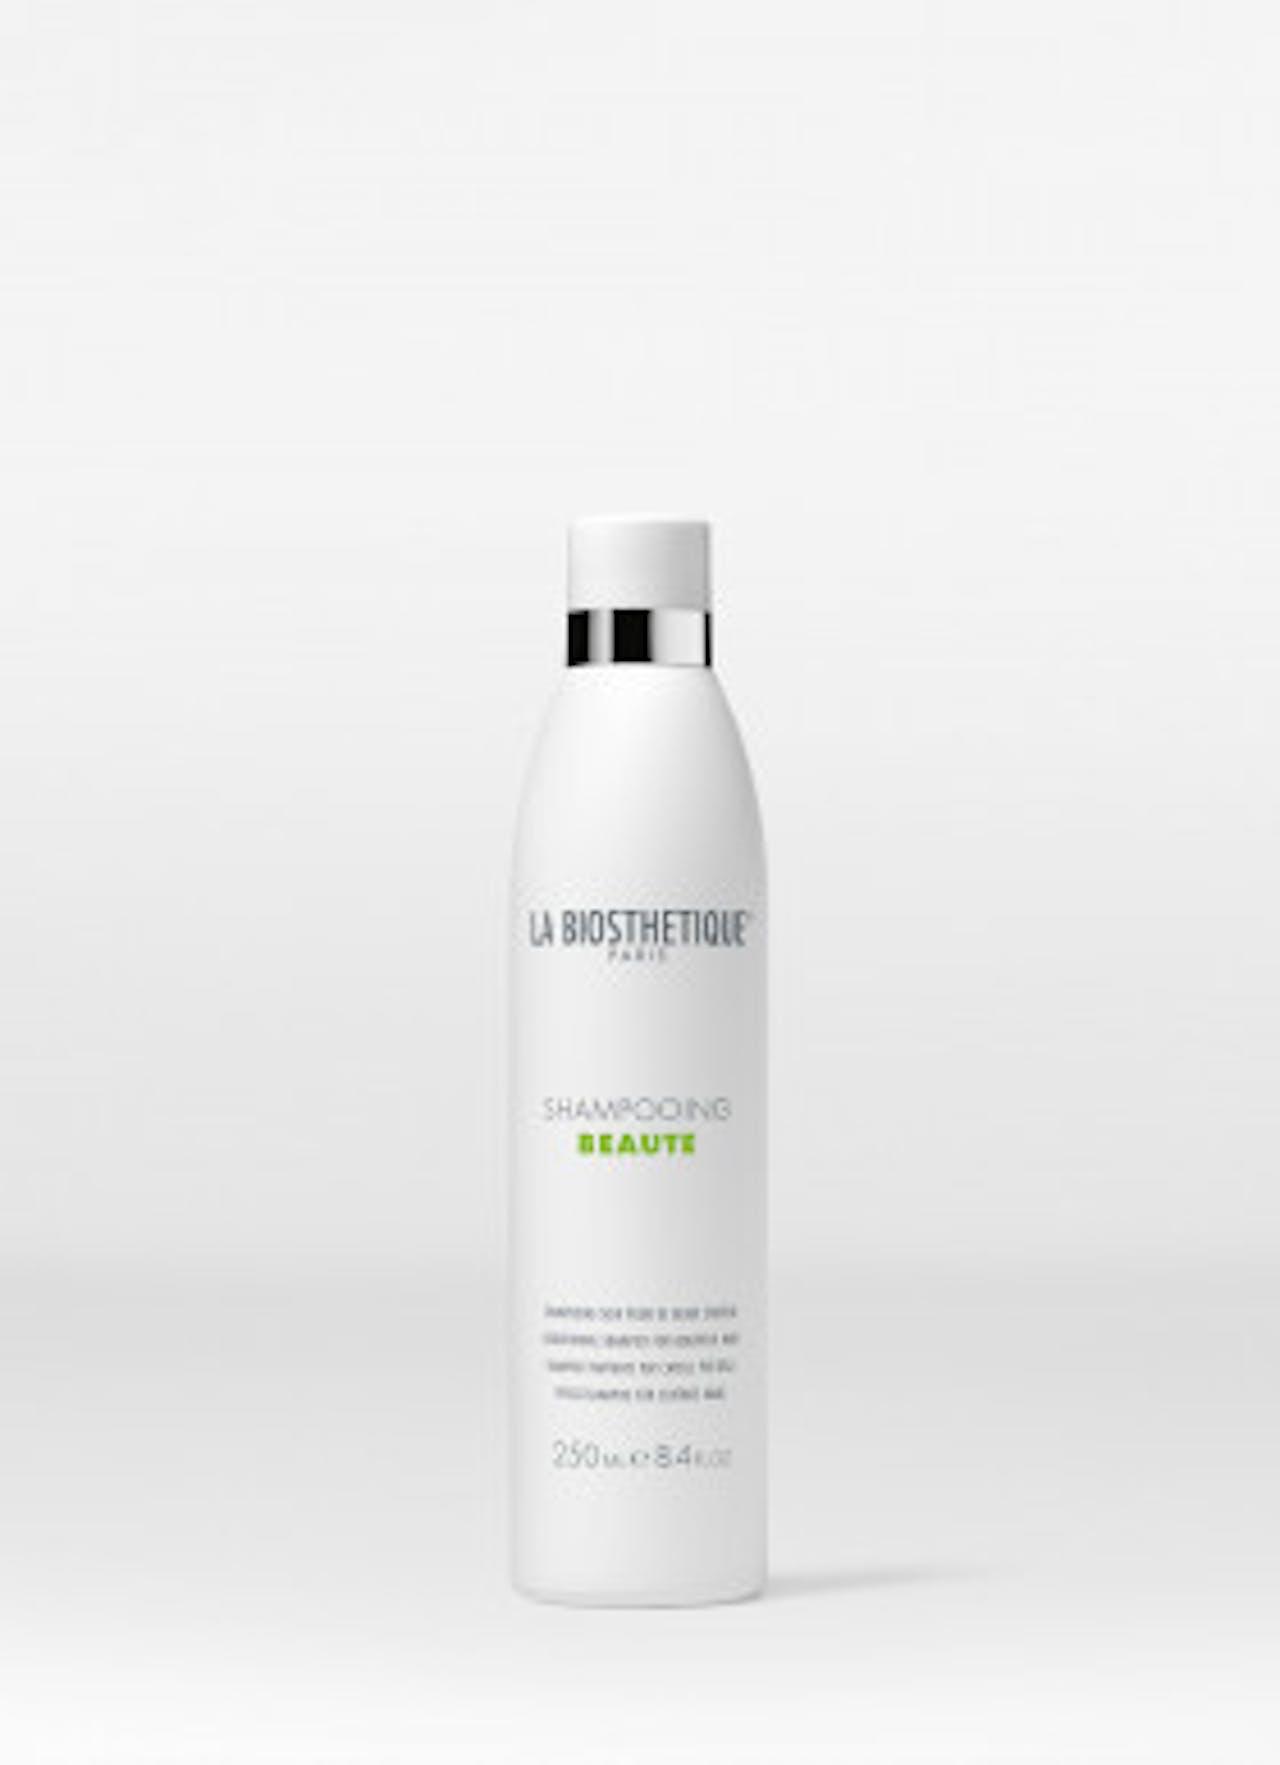 Shampooing Beauté Image